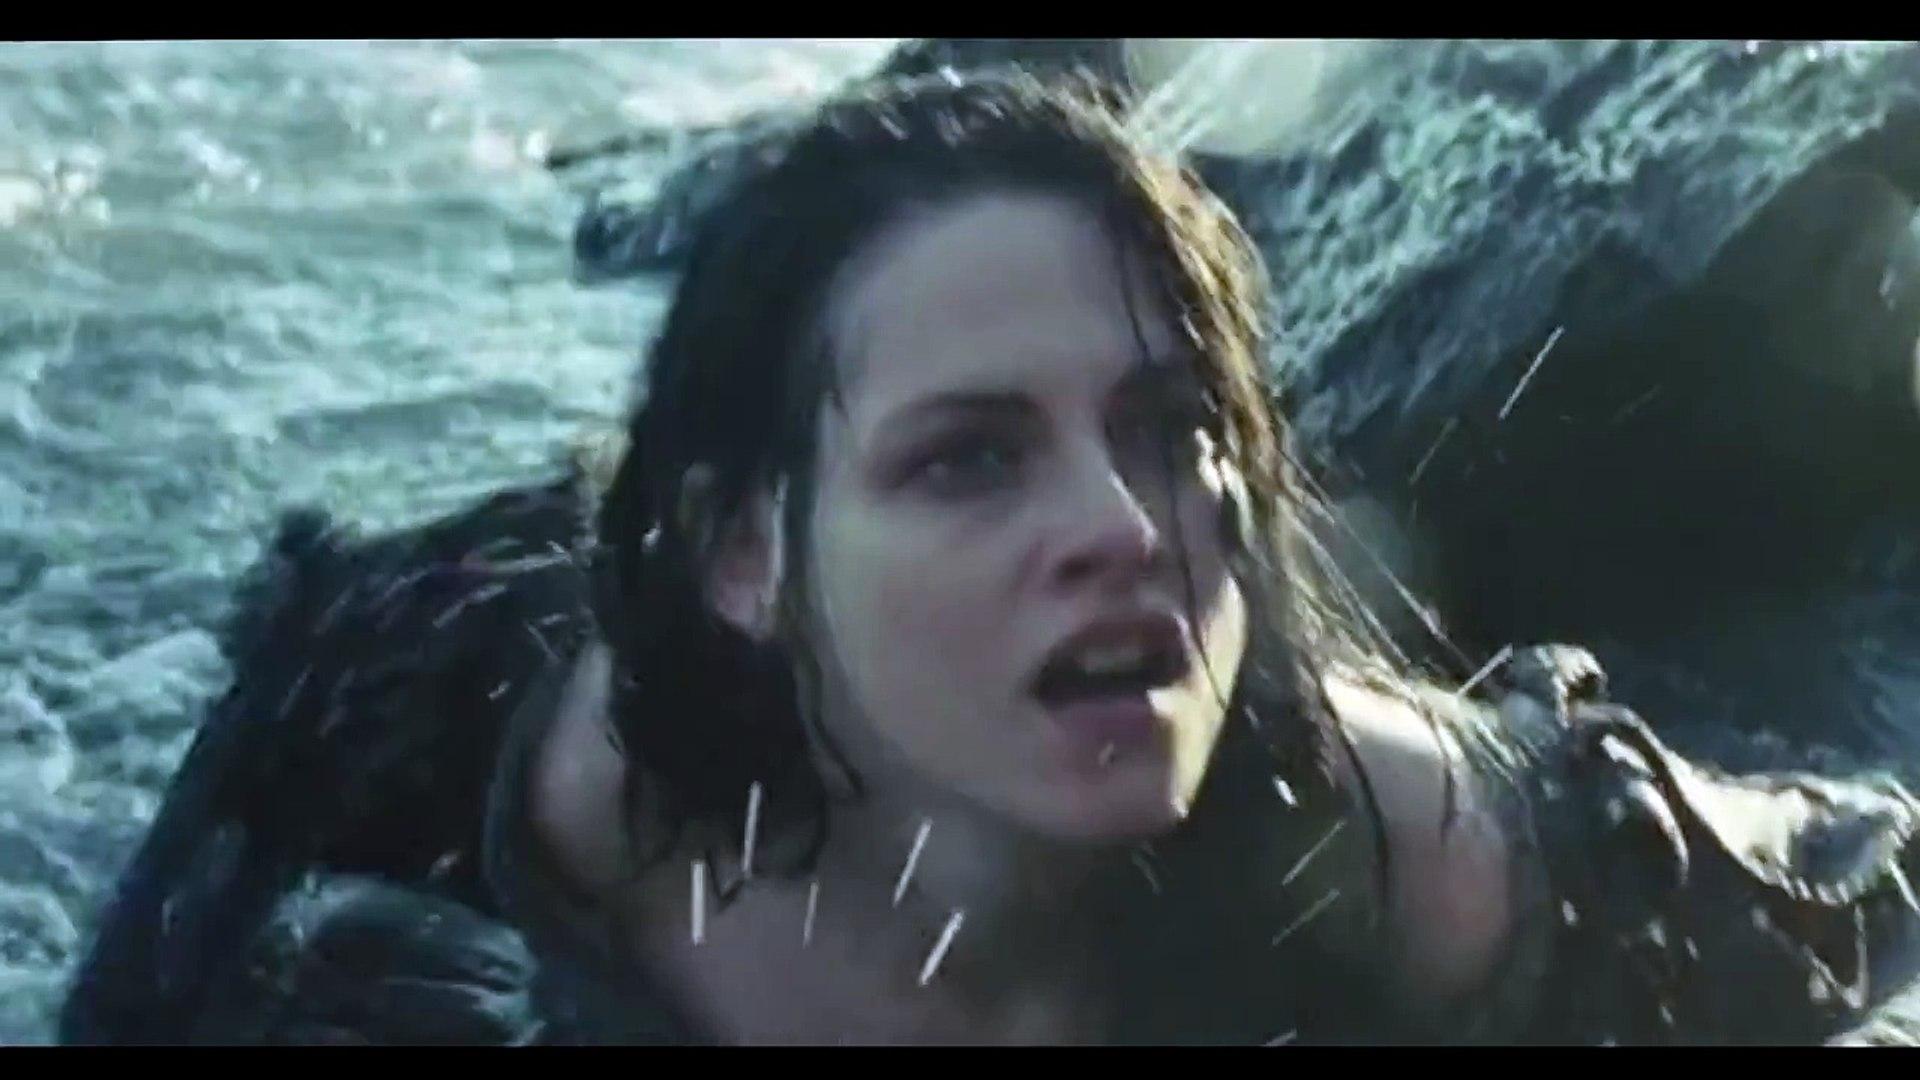 Little Mermaid 2016 Kristen Stewart Movie Hd Video Dailymotion